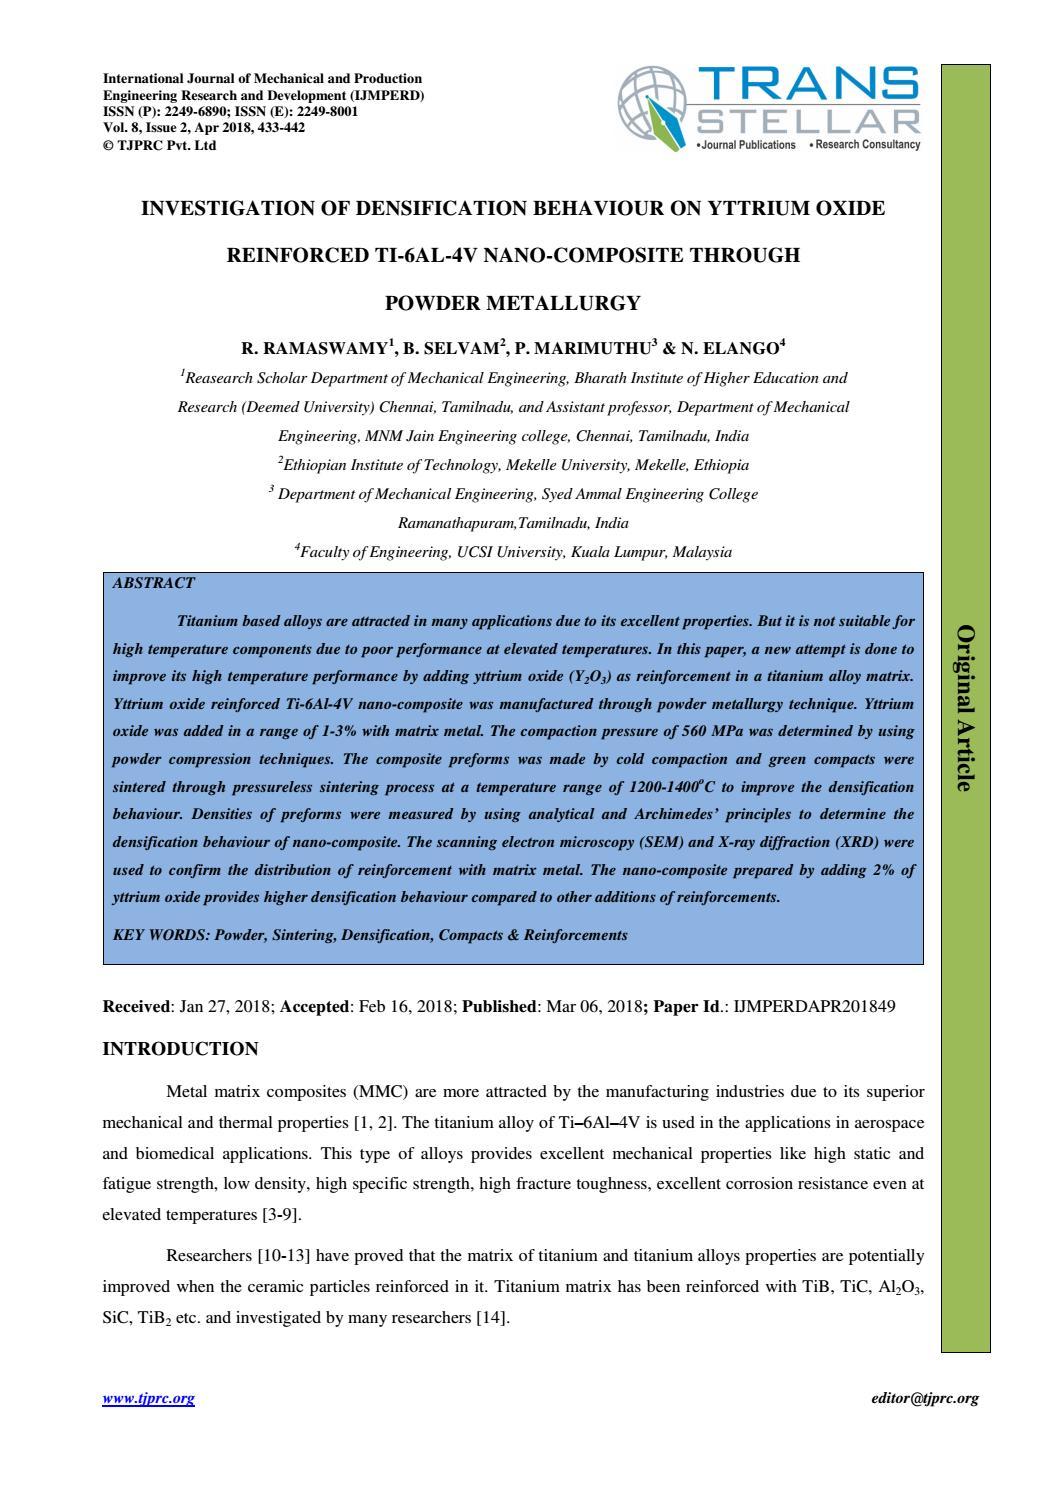 Investigation of Densification Behaviour on Yttrium Oxide